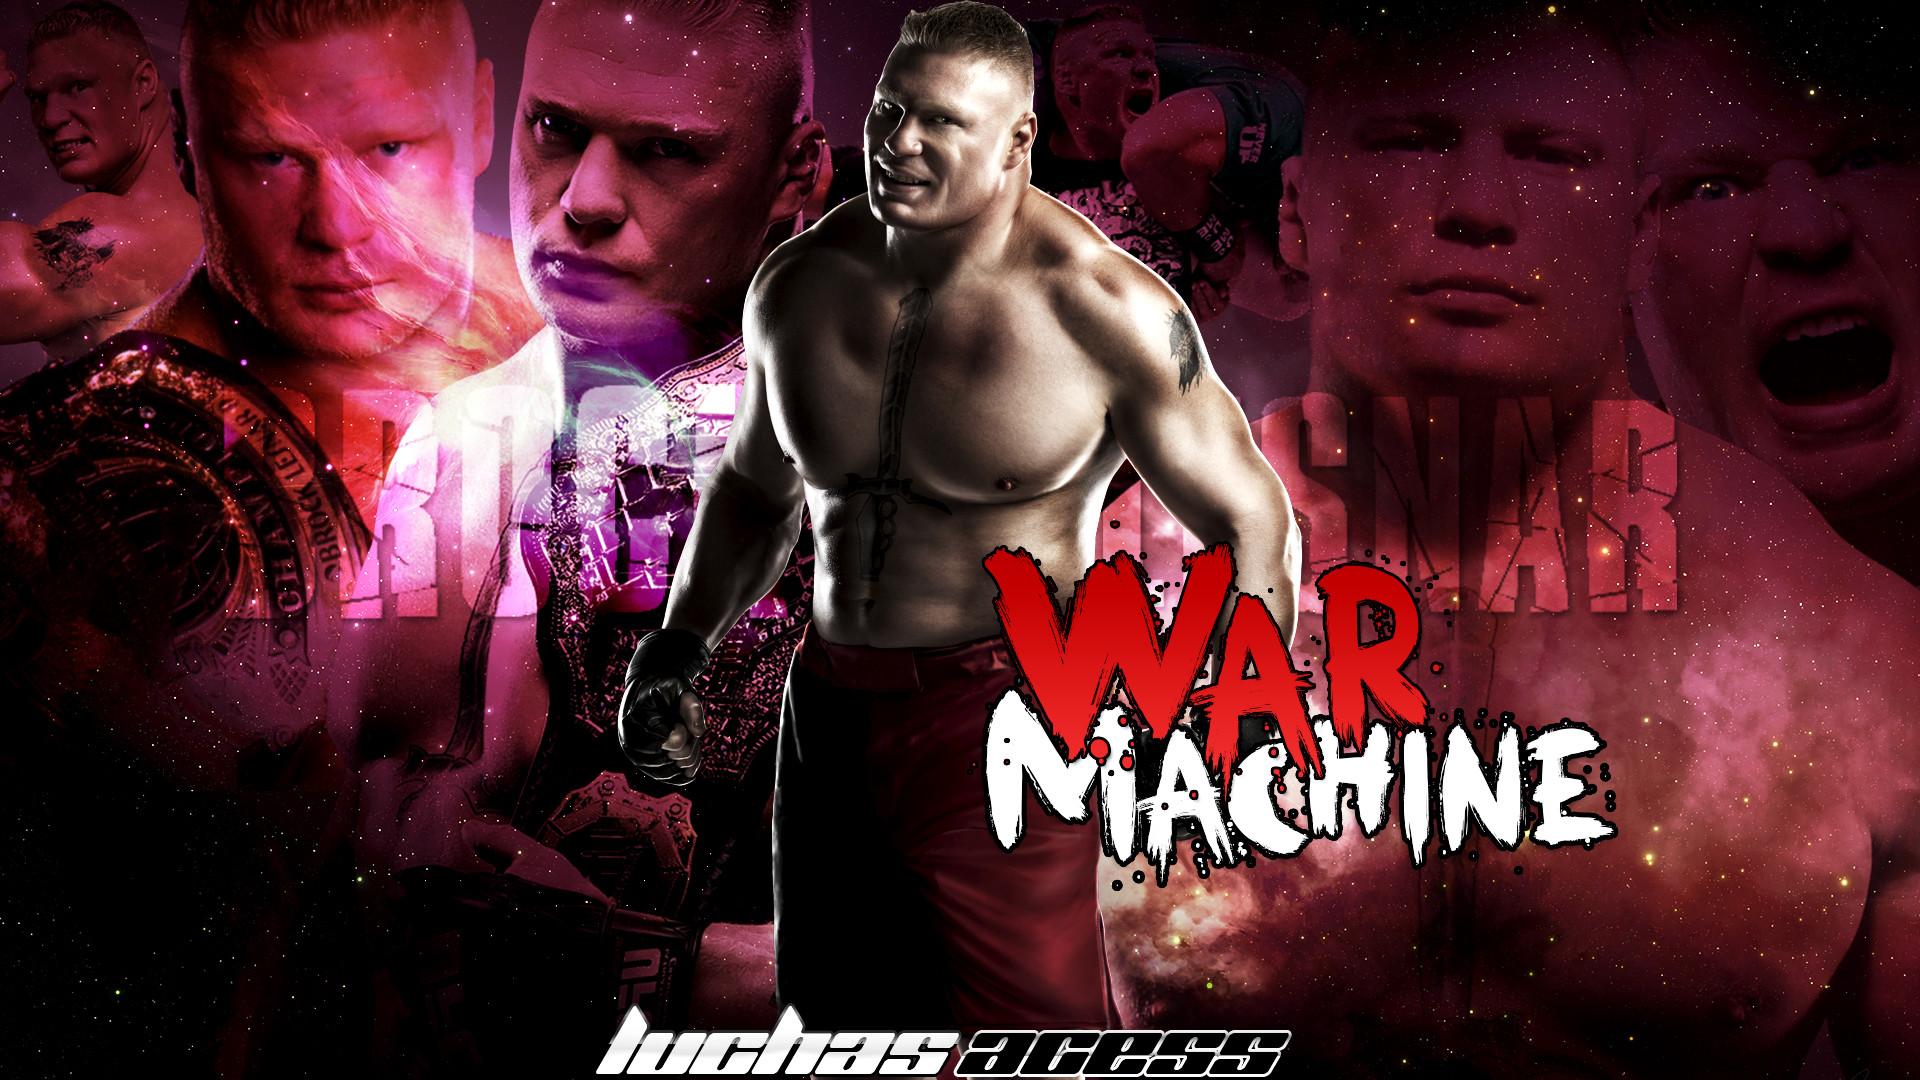 1920x1080 WWE Wrestlemania XXIX Custom Wallpaper The Rock Vs Brock Lesnar 1920A 1080 Wwe